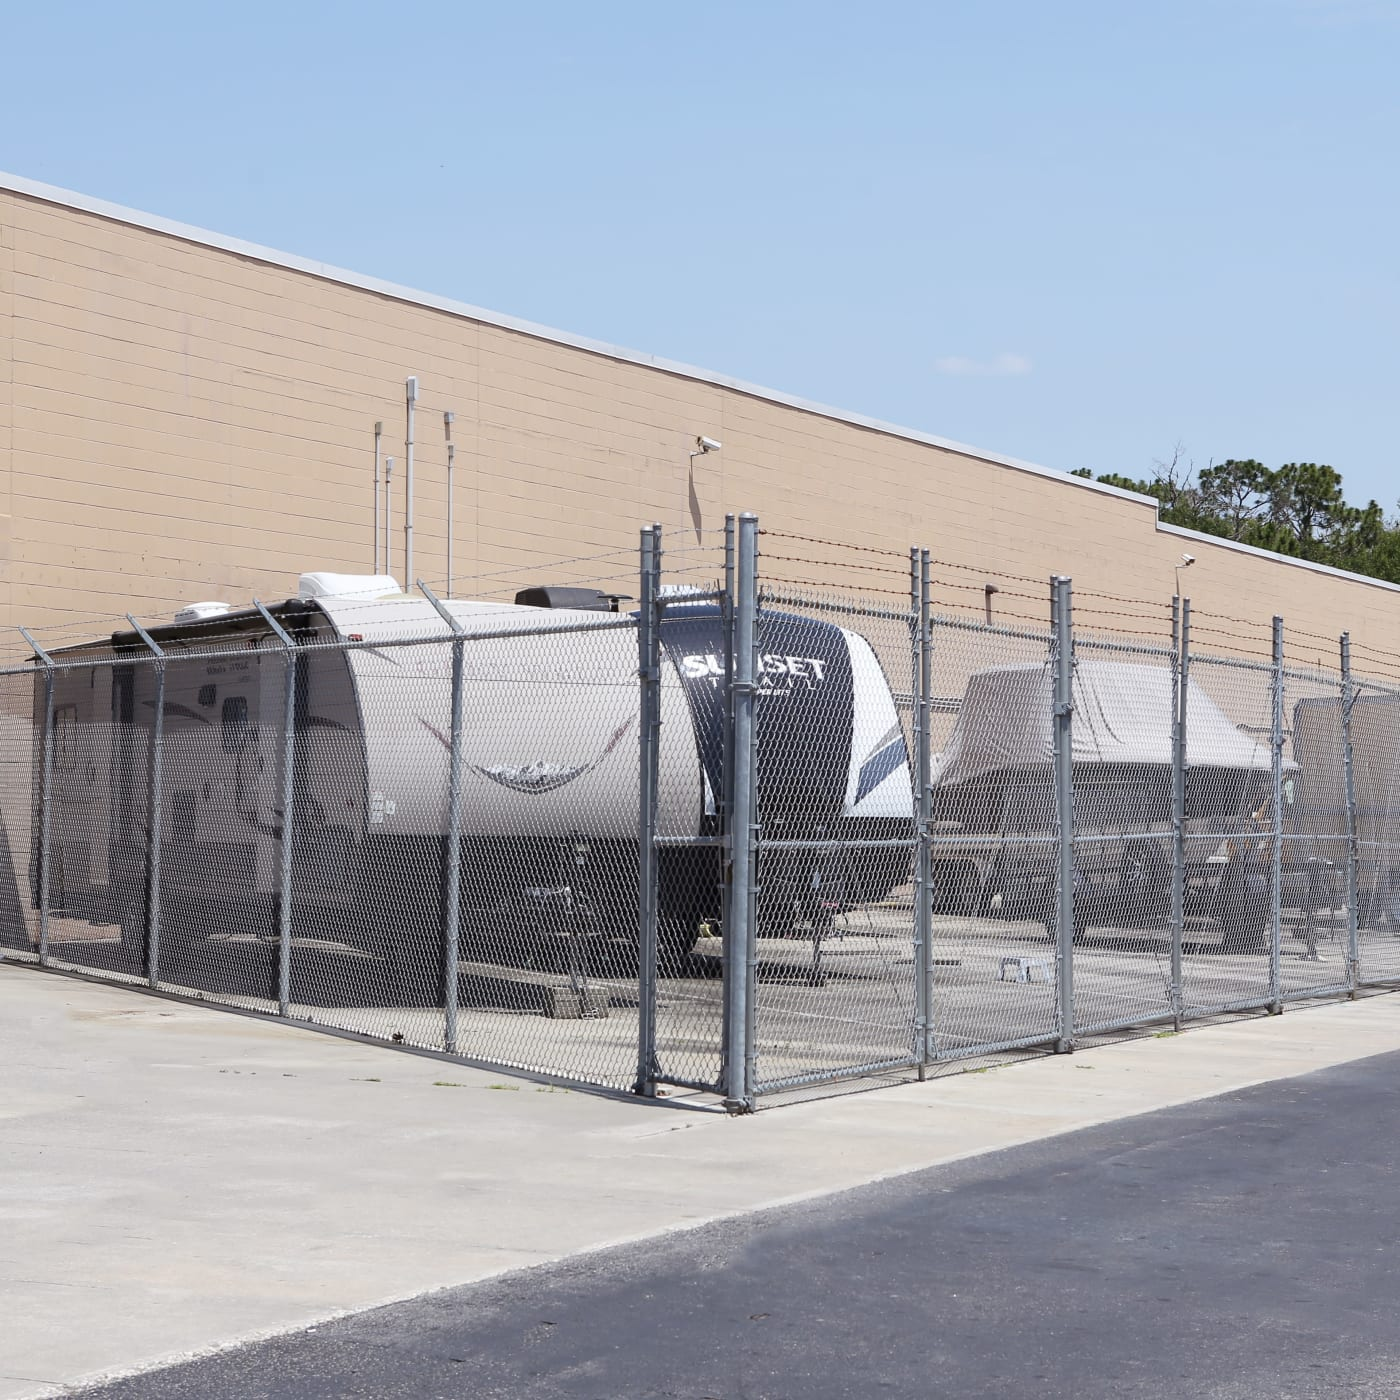 RV parking at Midgard Self Storage in Jacksonville, Florida